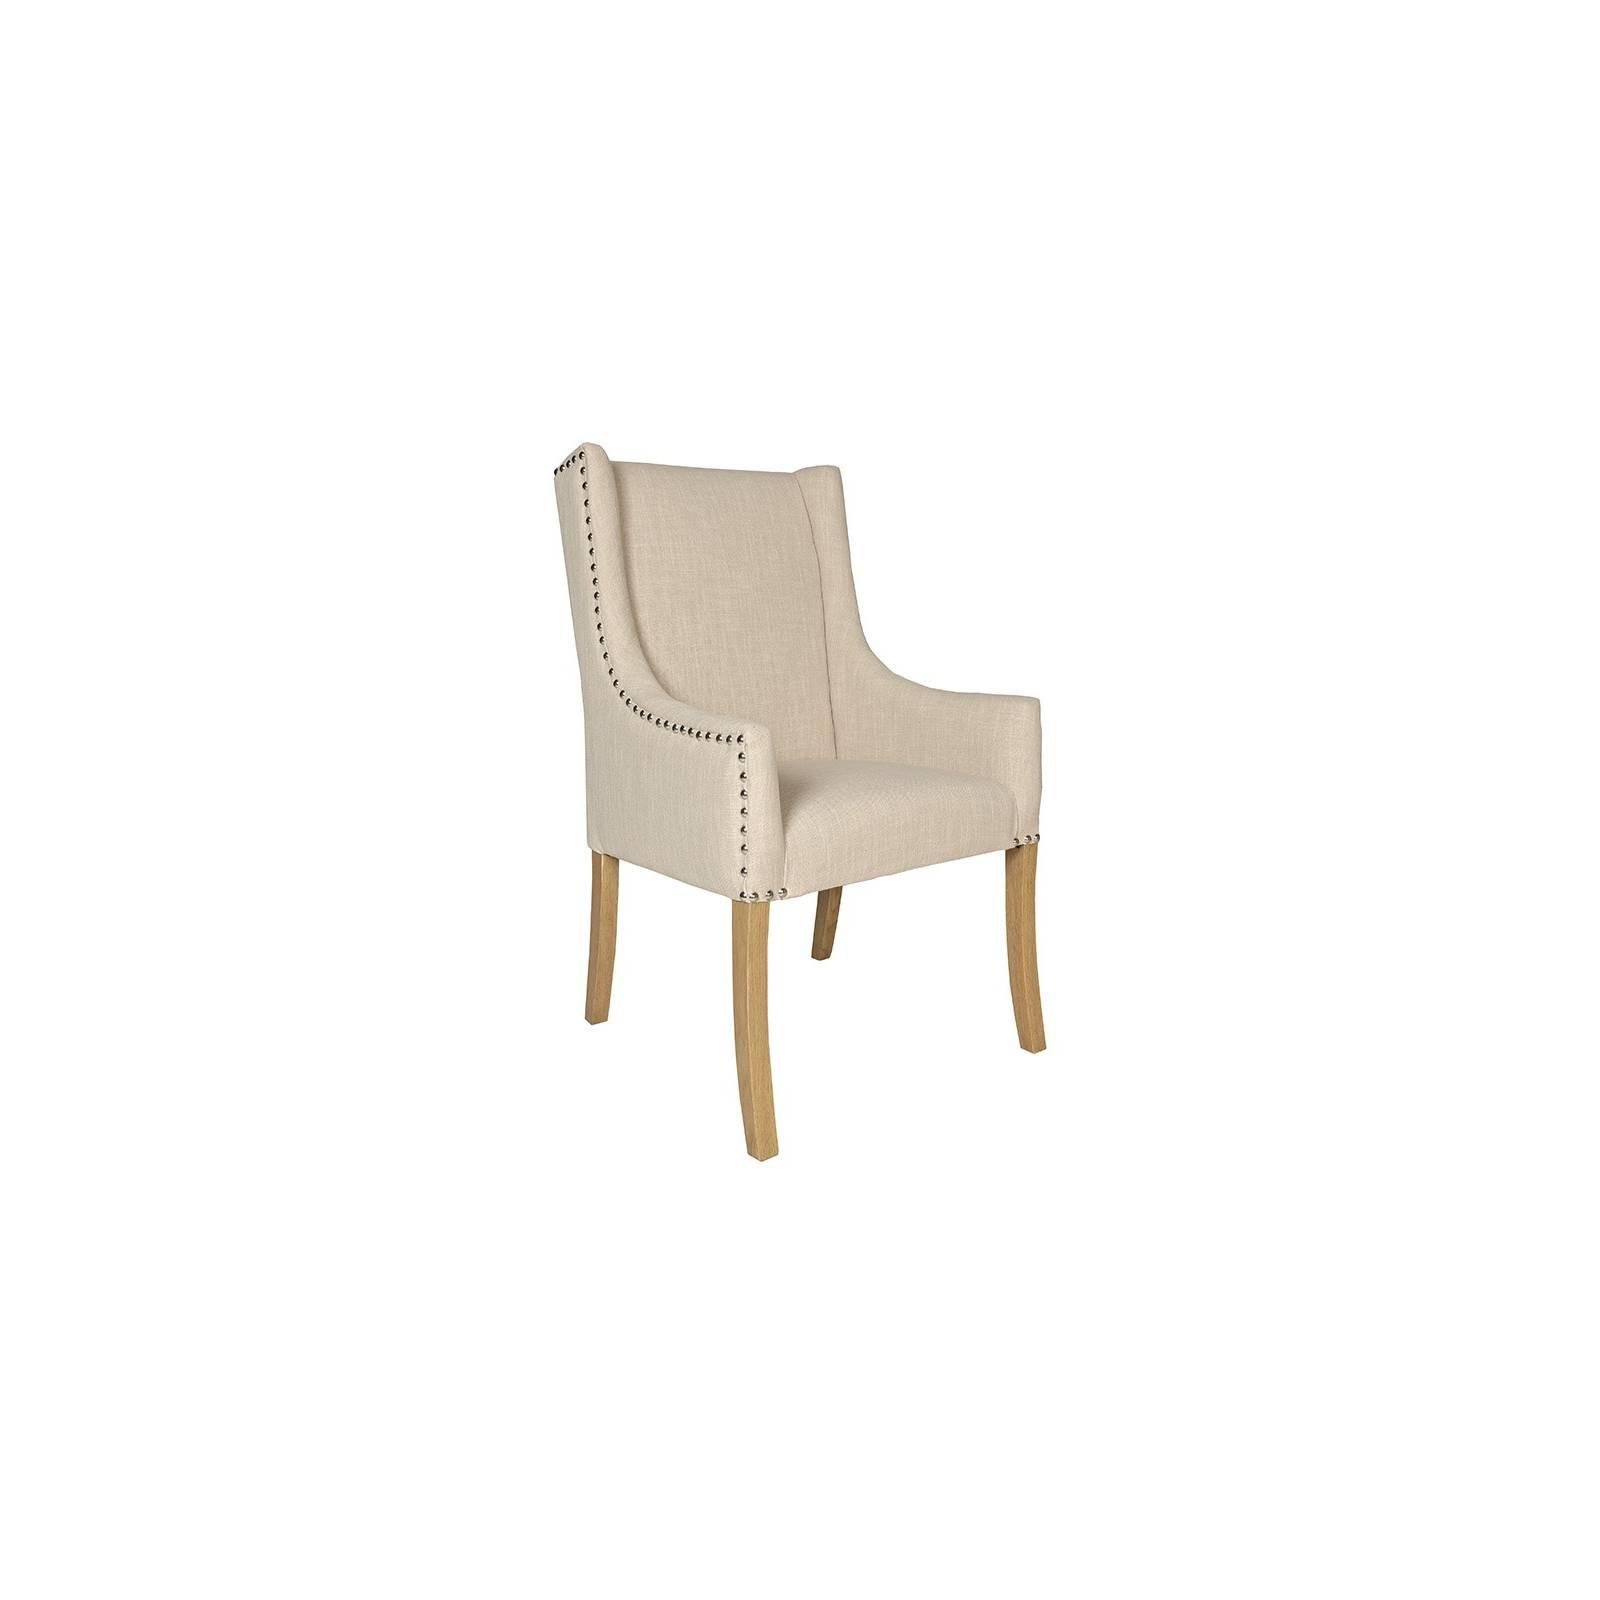 Chaise Geneva Tissu - Chaise haut de gamme